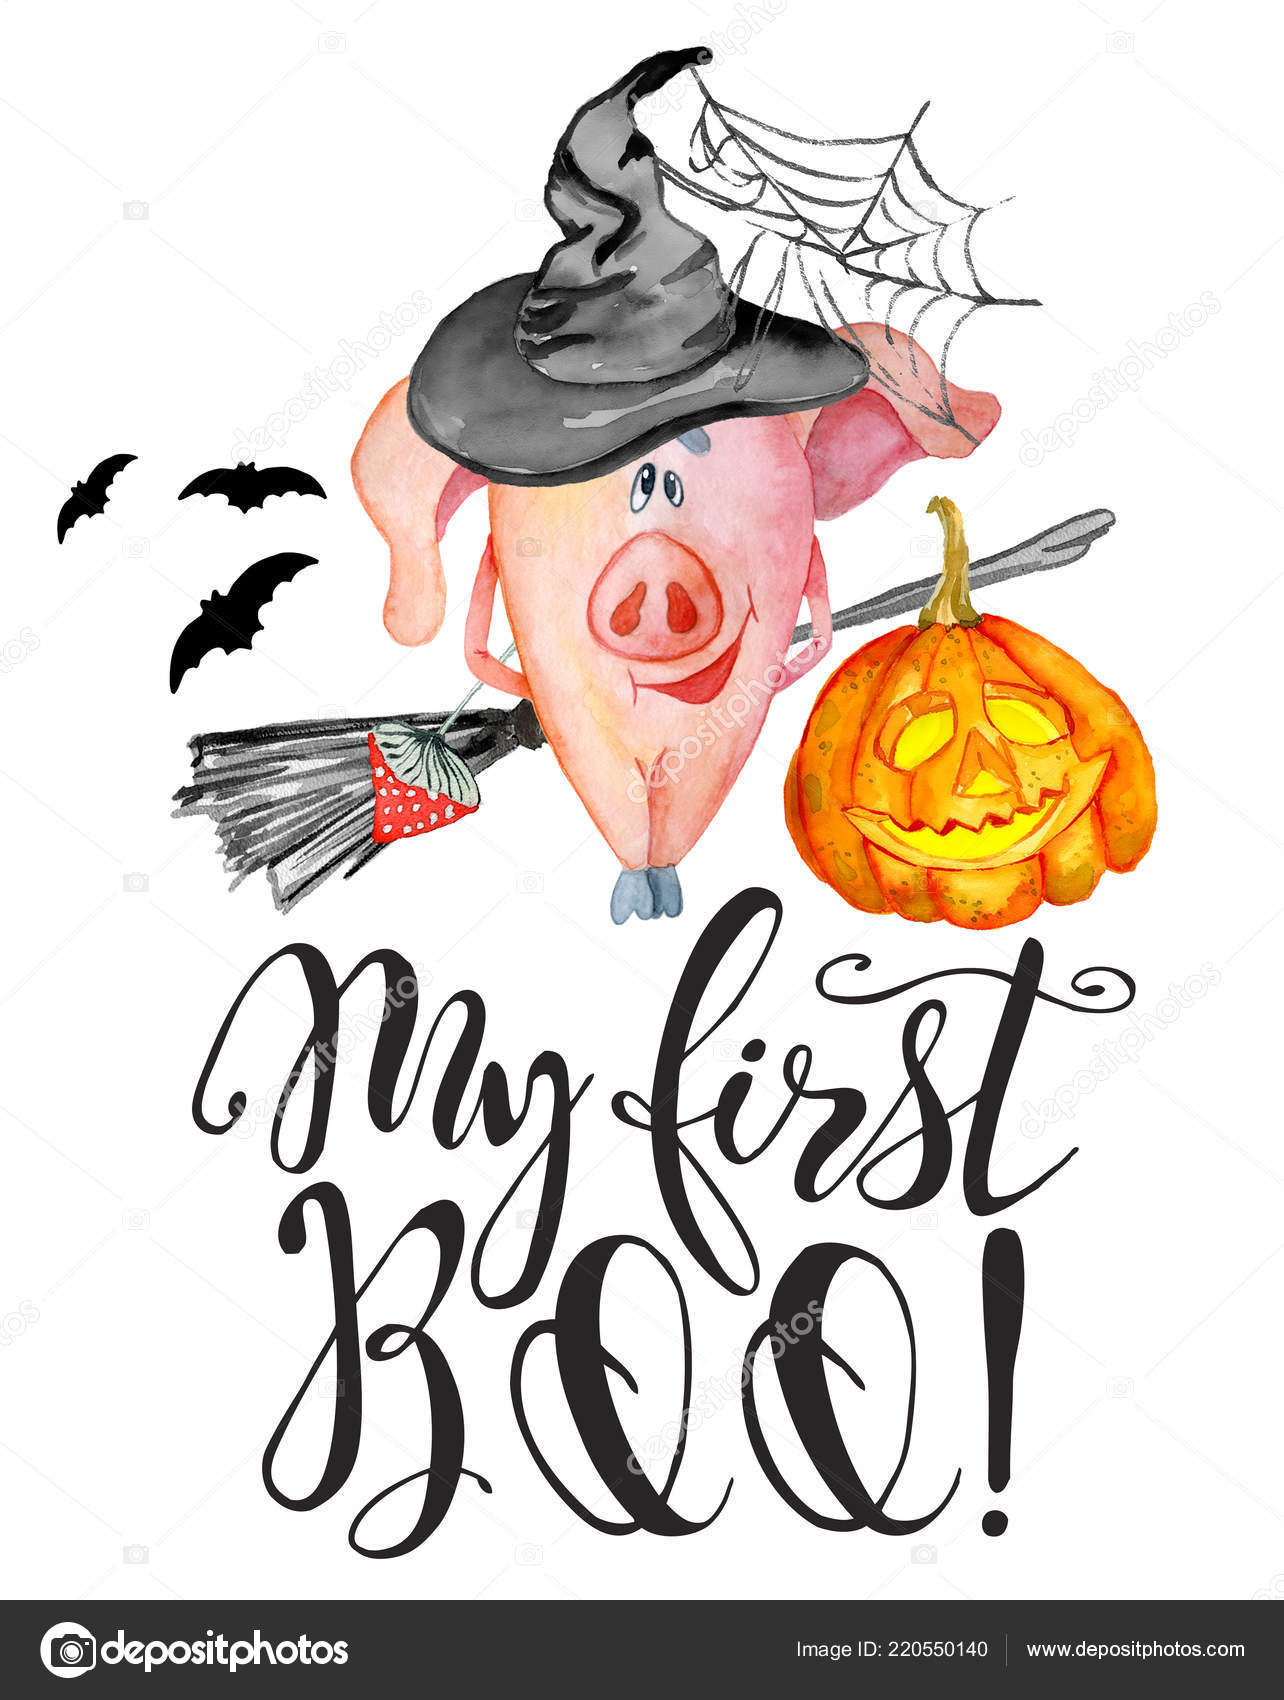 Хэллоуин в 2019 году картинки